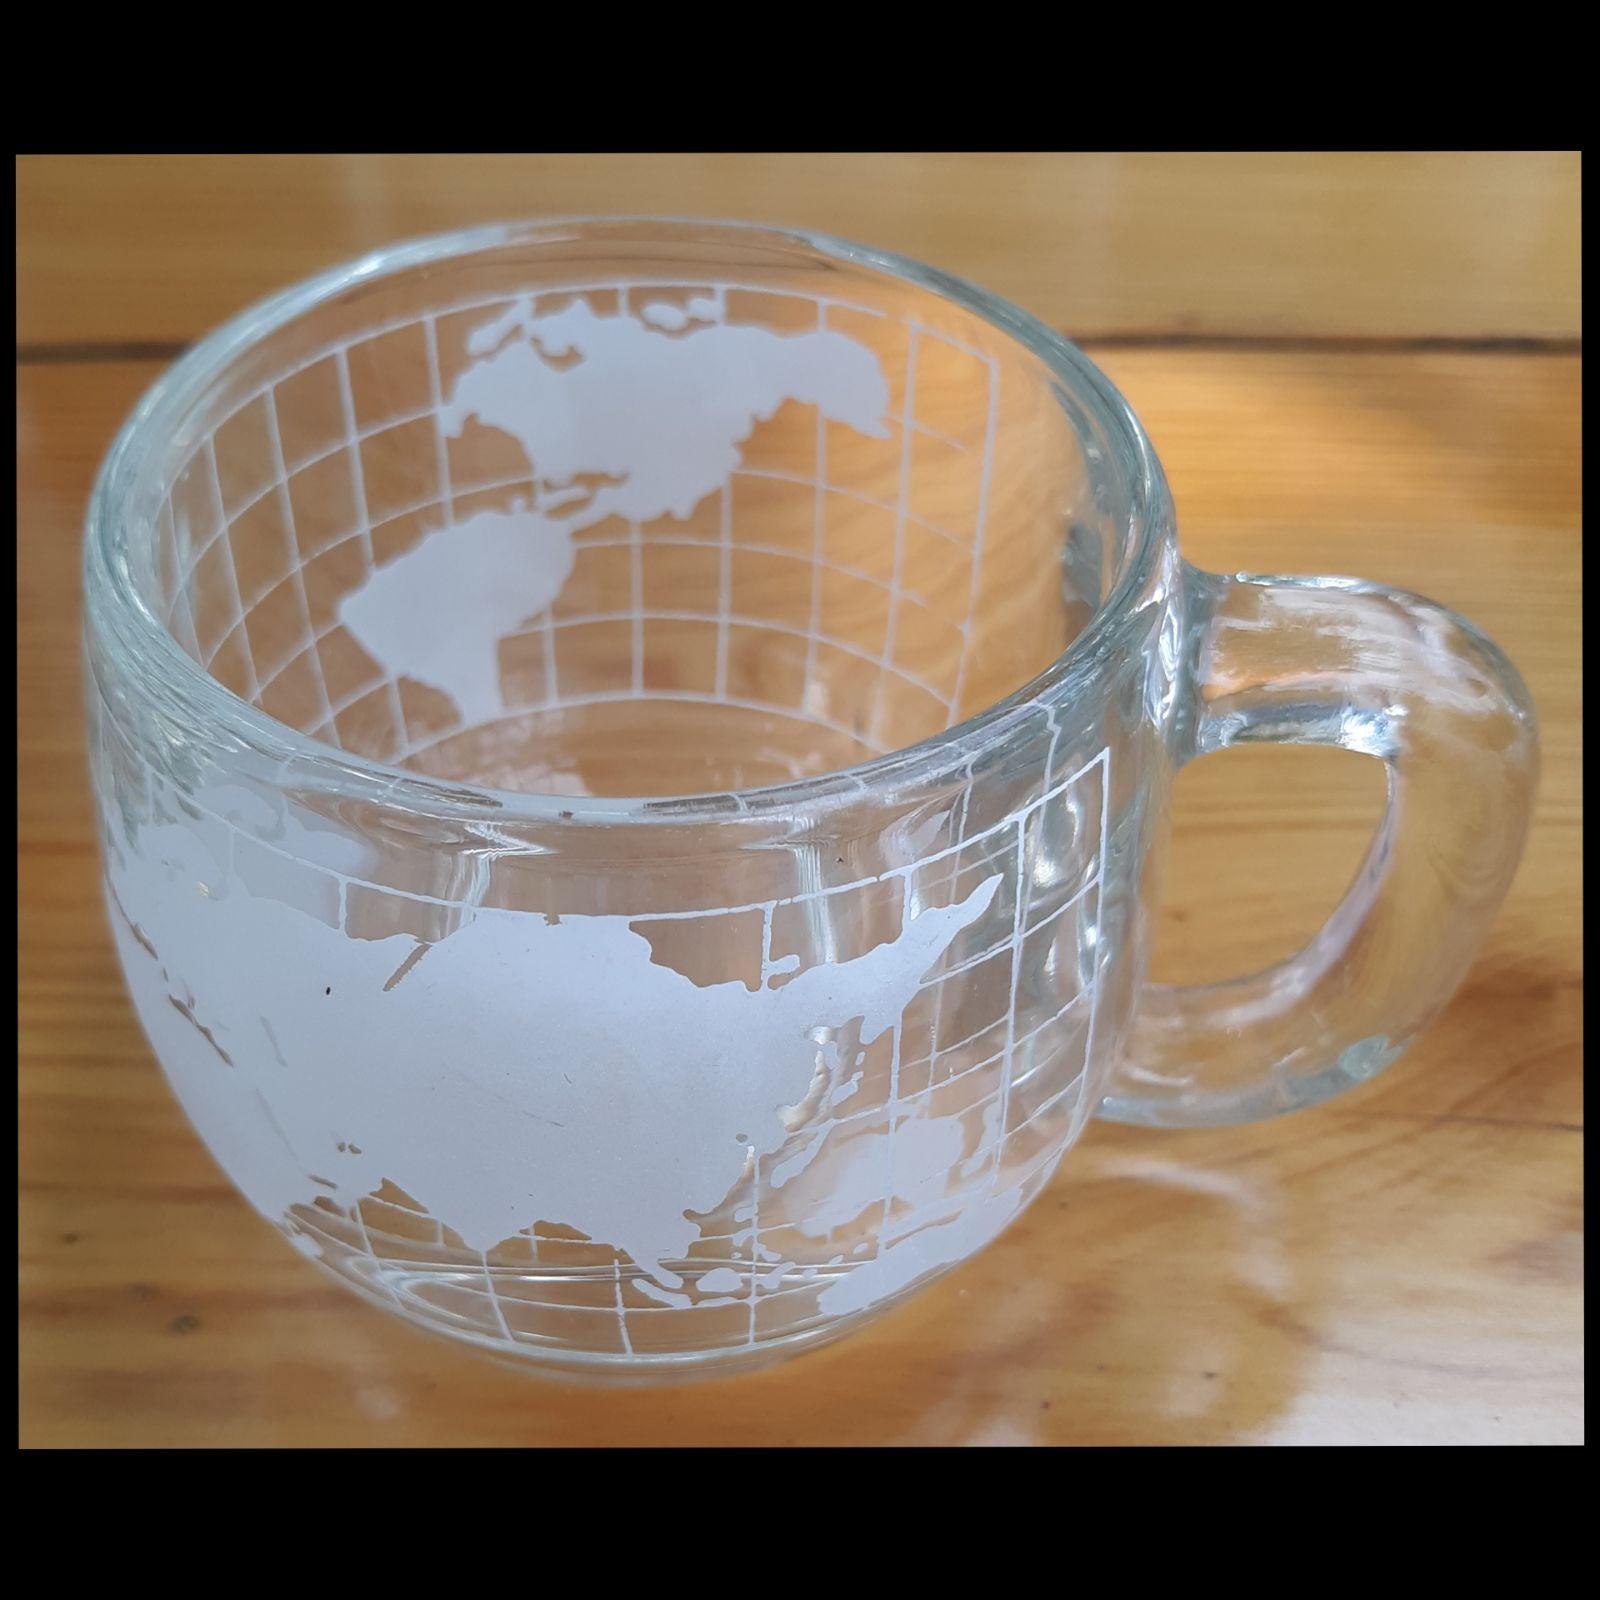 Nestle Nescafe World Globe Coffee Cup